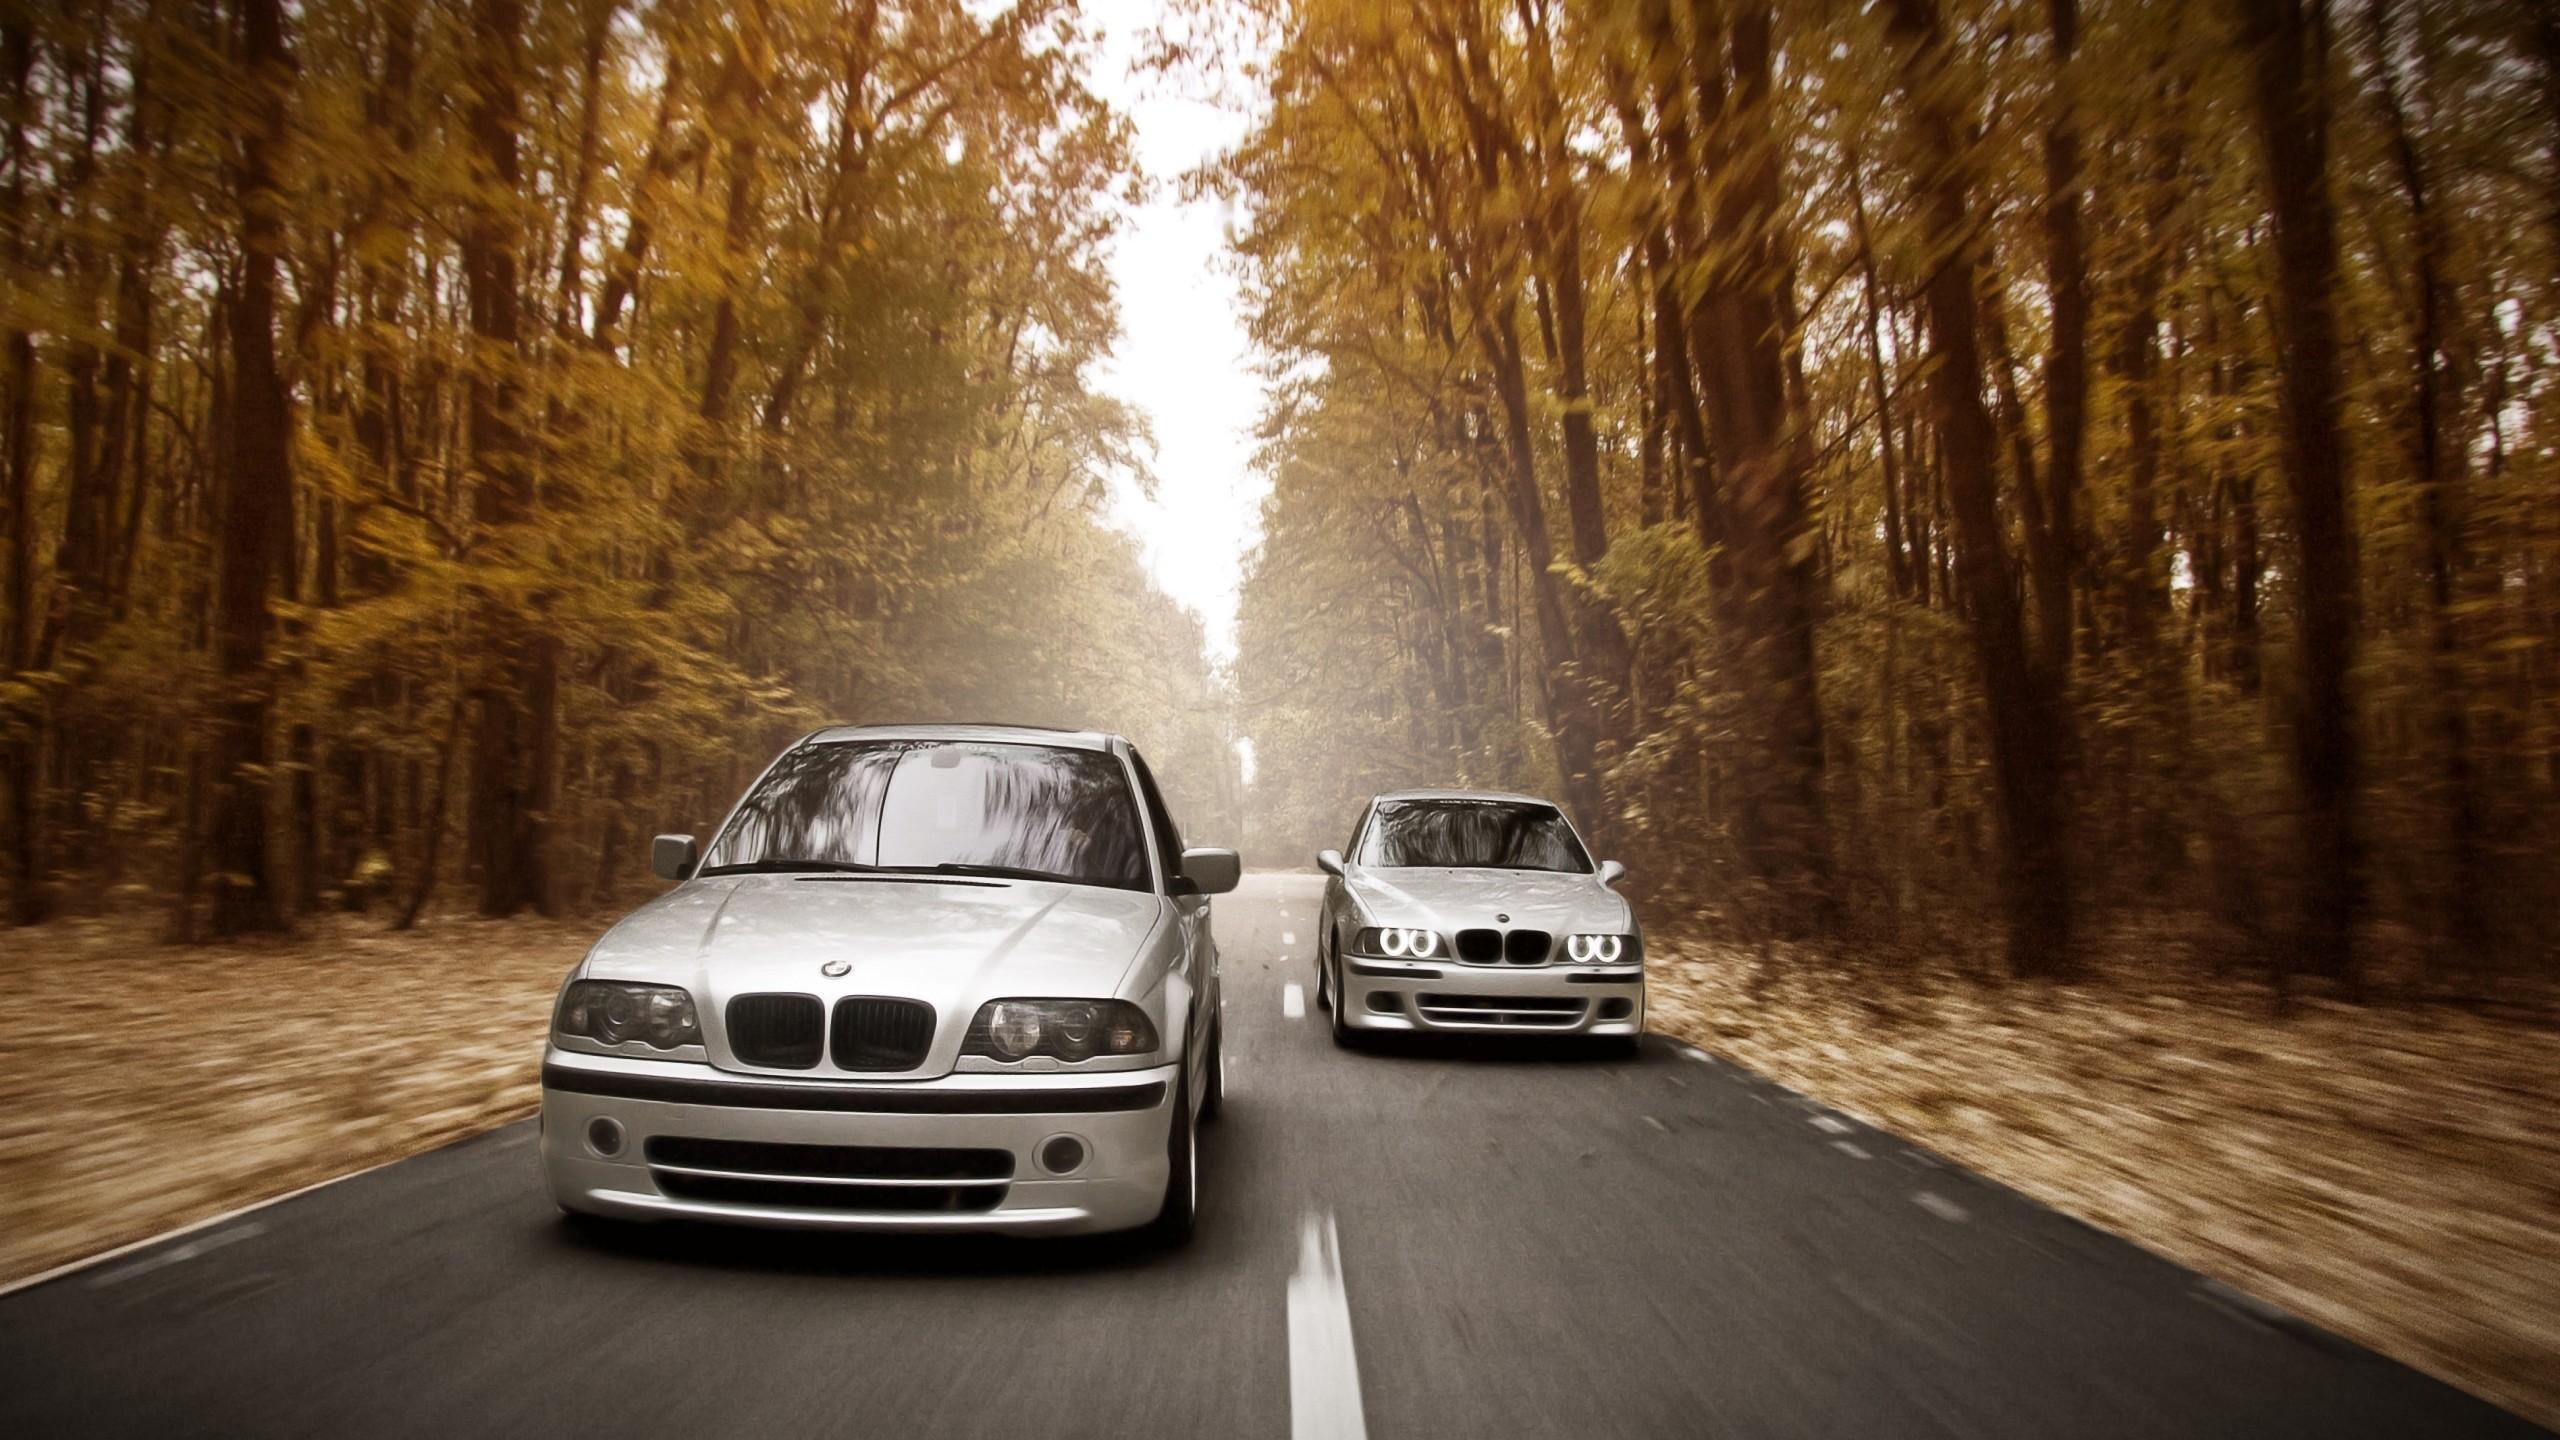 1920x1080 BMW M3 E46 Crystal City Car 2014 Blue